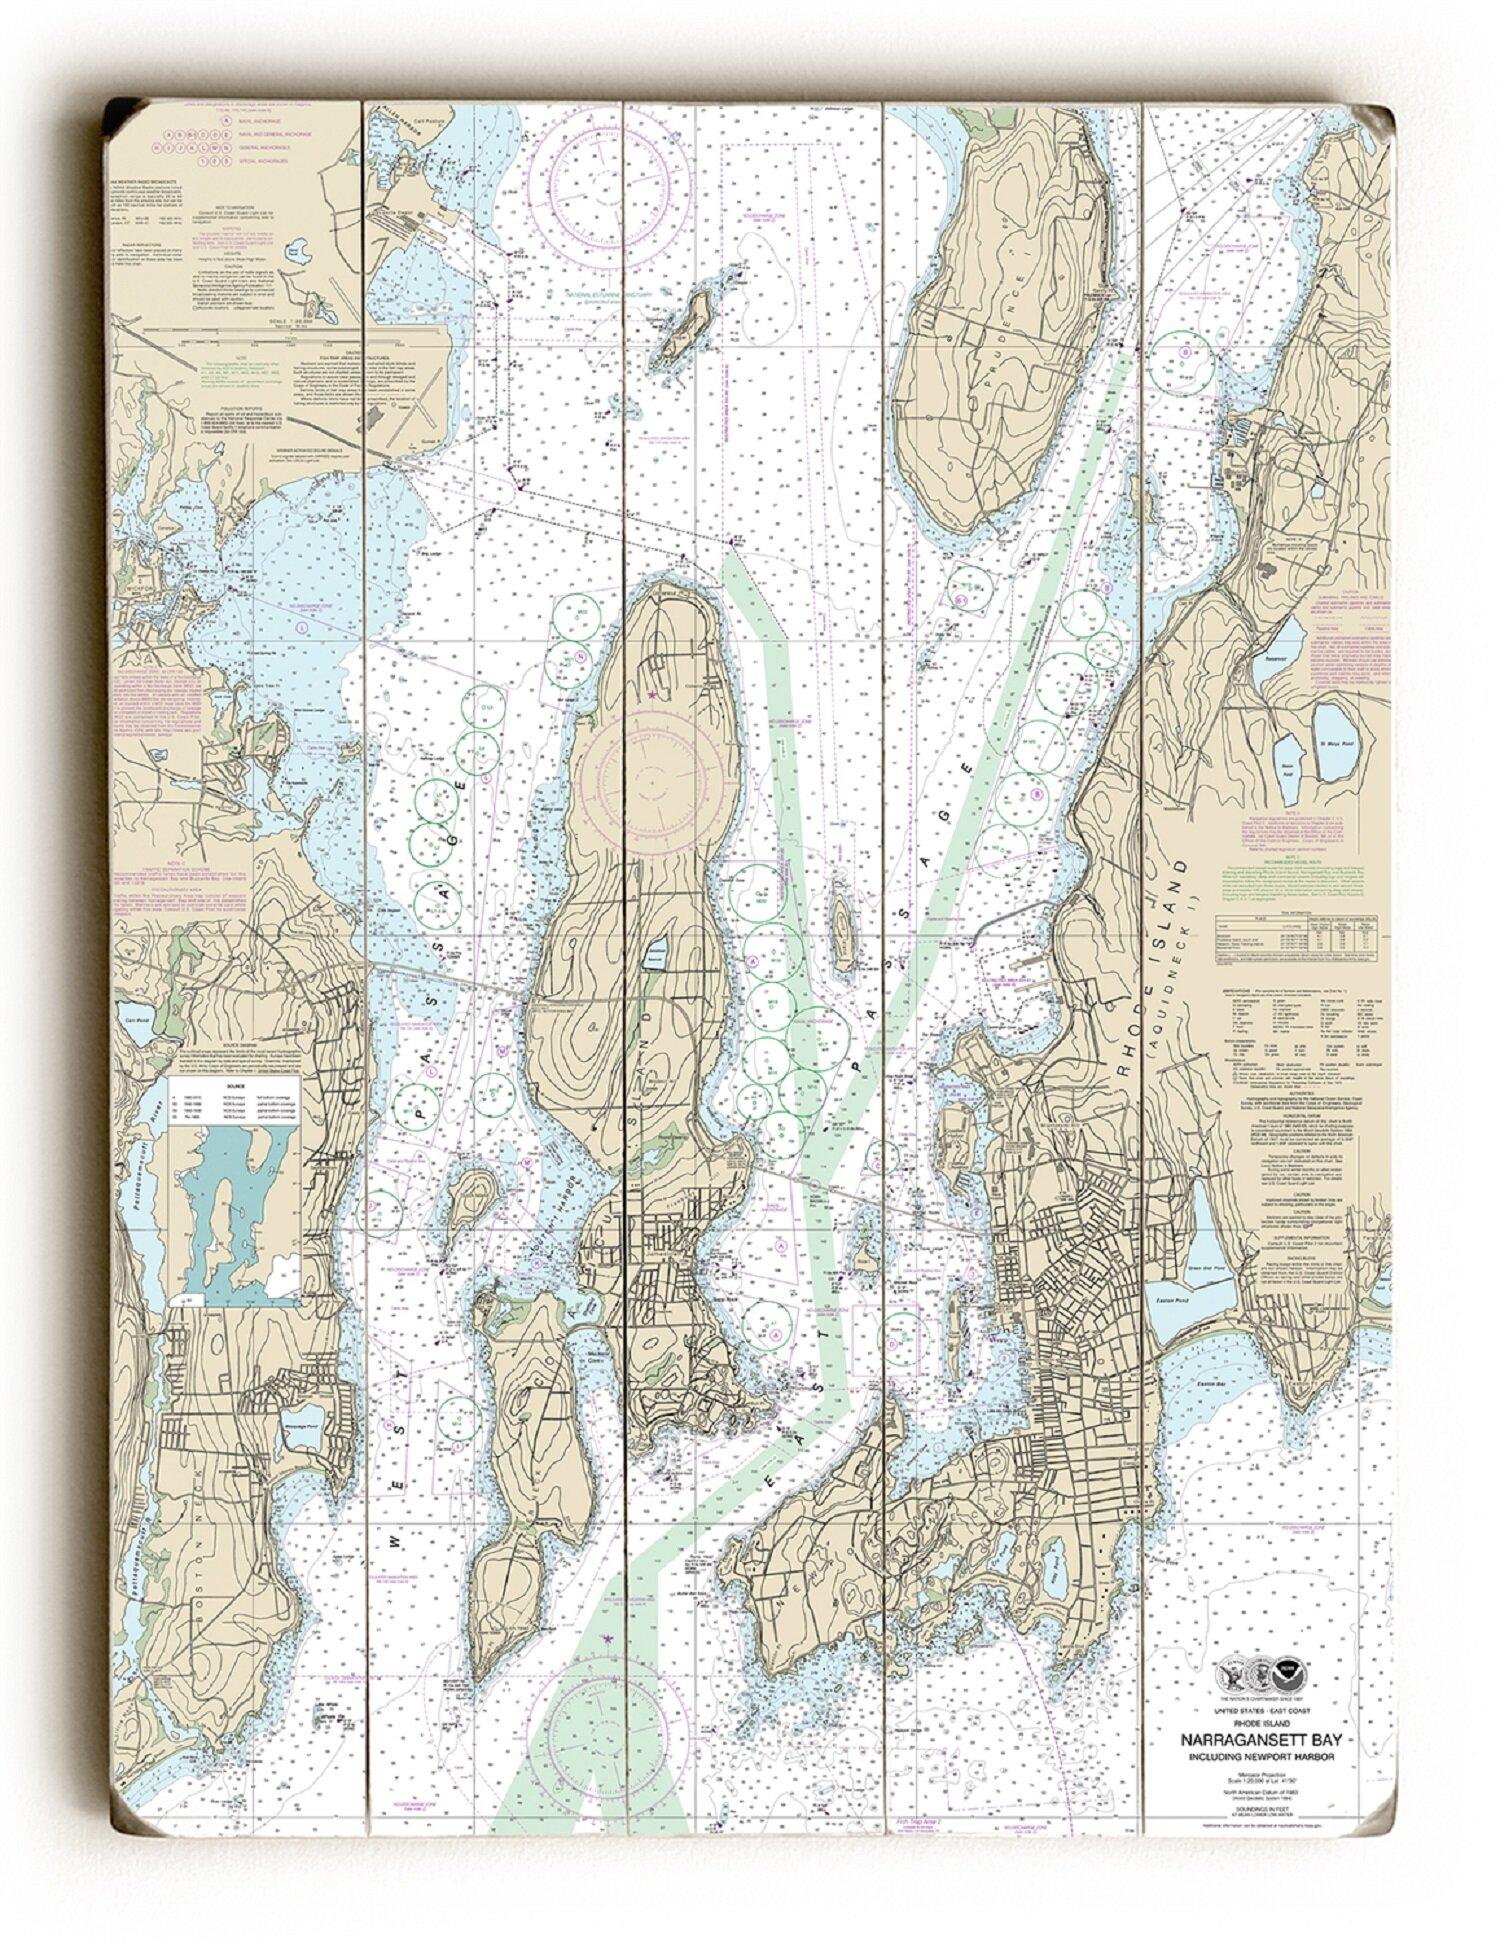 'RI: Narragansett Bay, Newport Harbor, RI Nautical Chart Sign' Graphic Art  Print on Wood